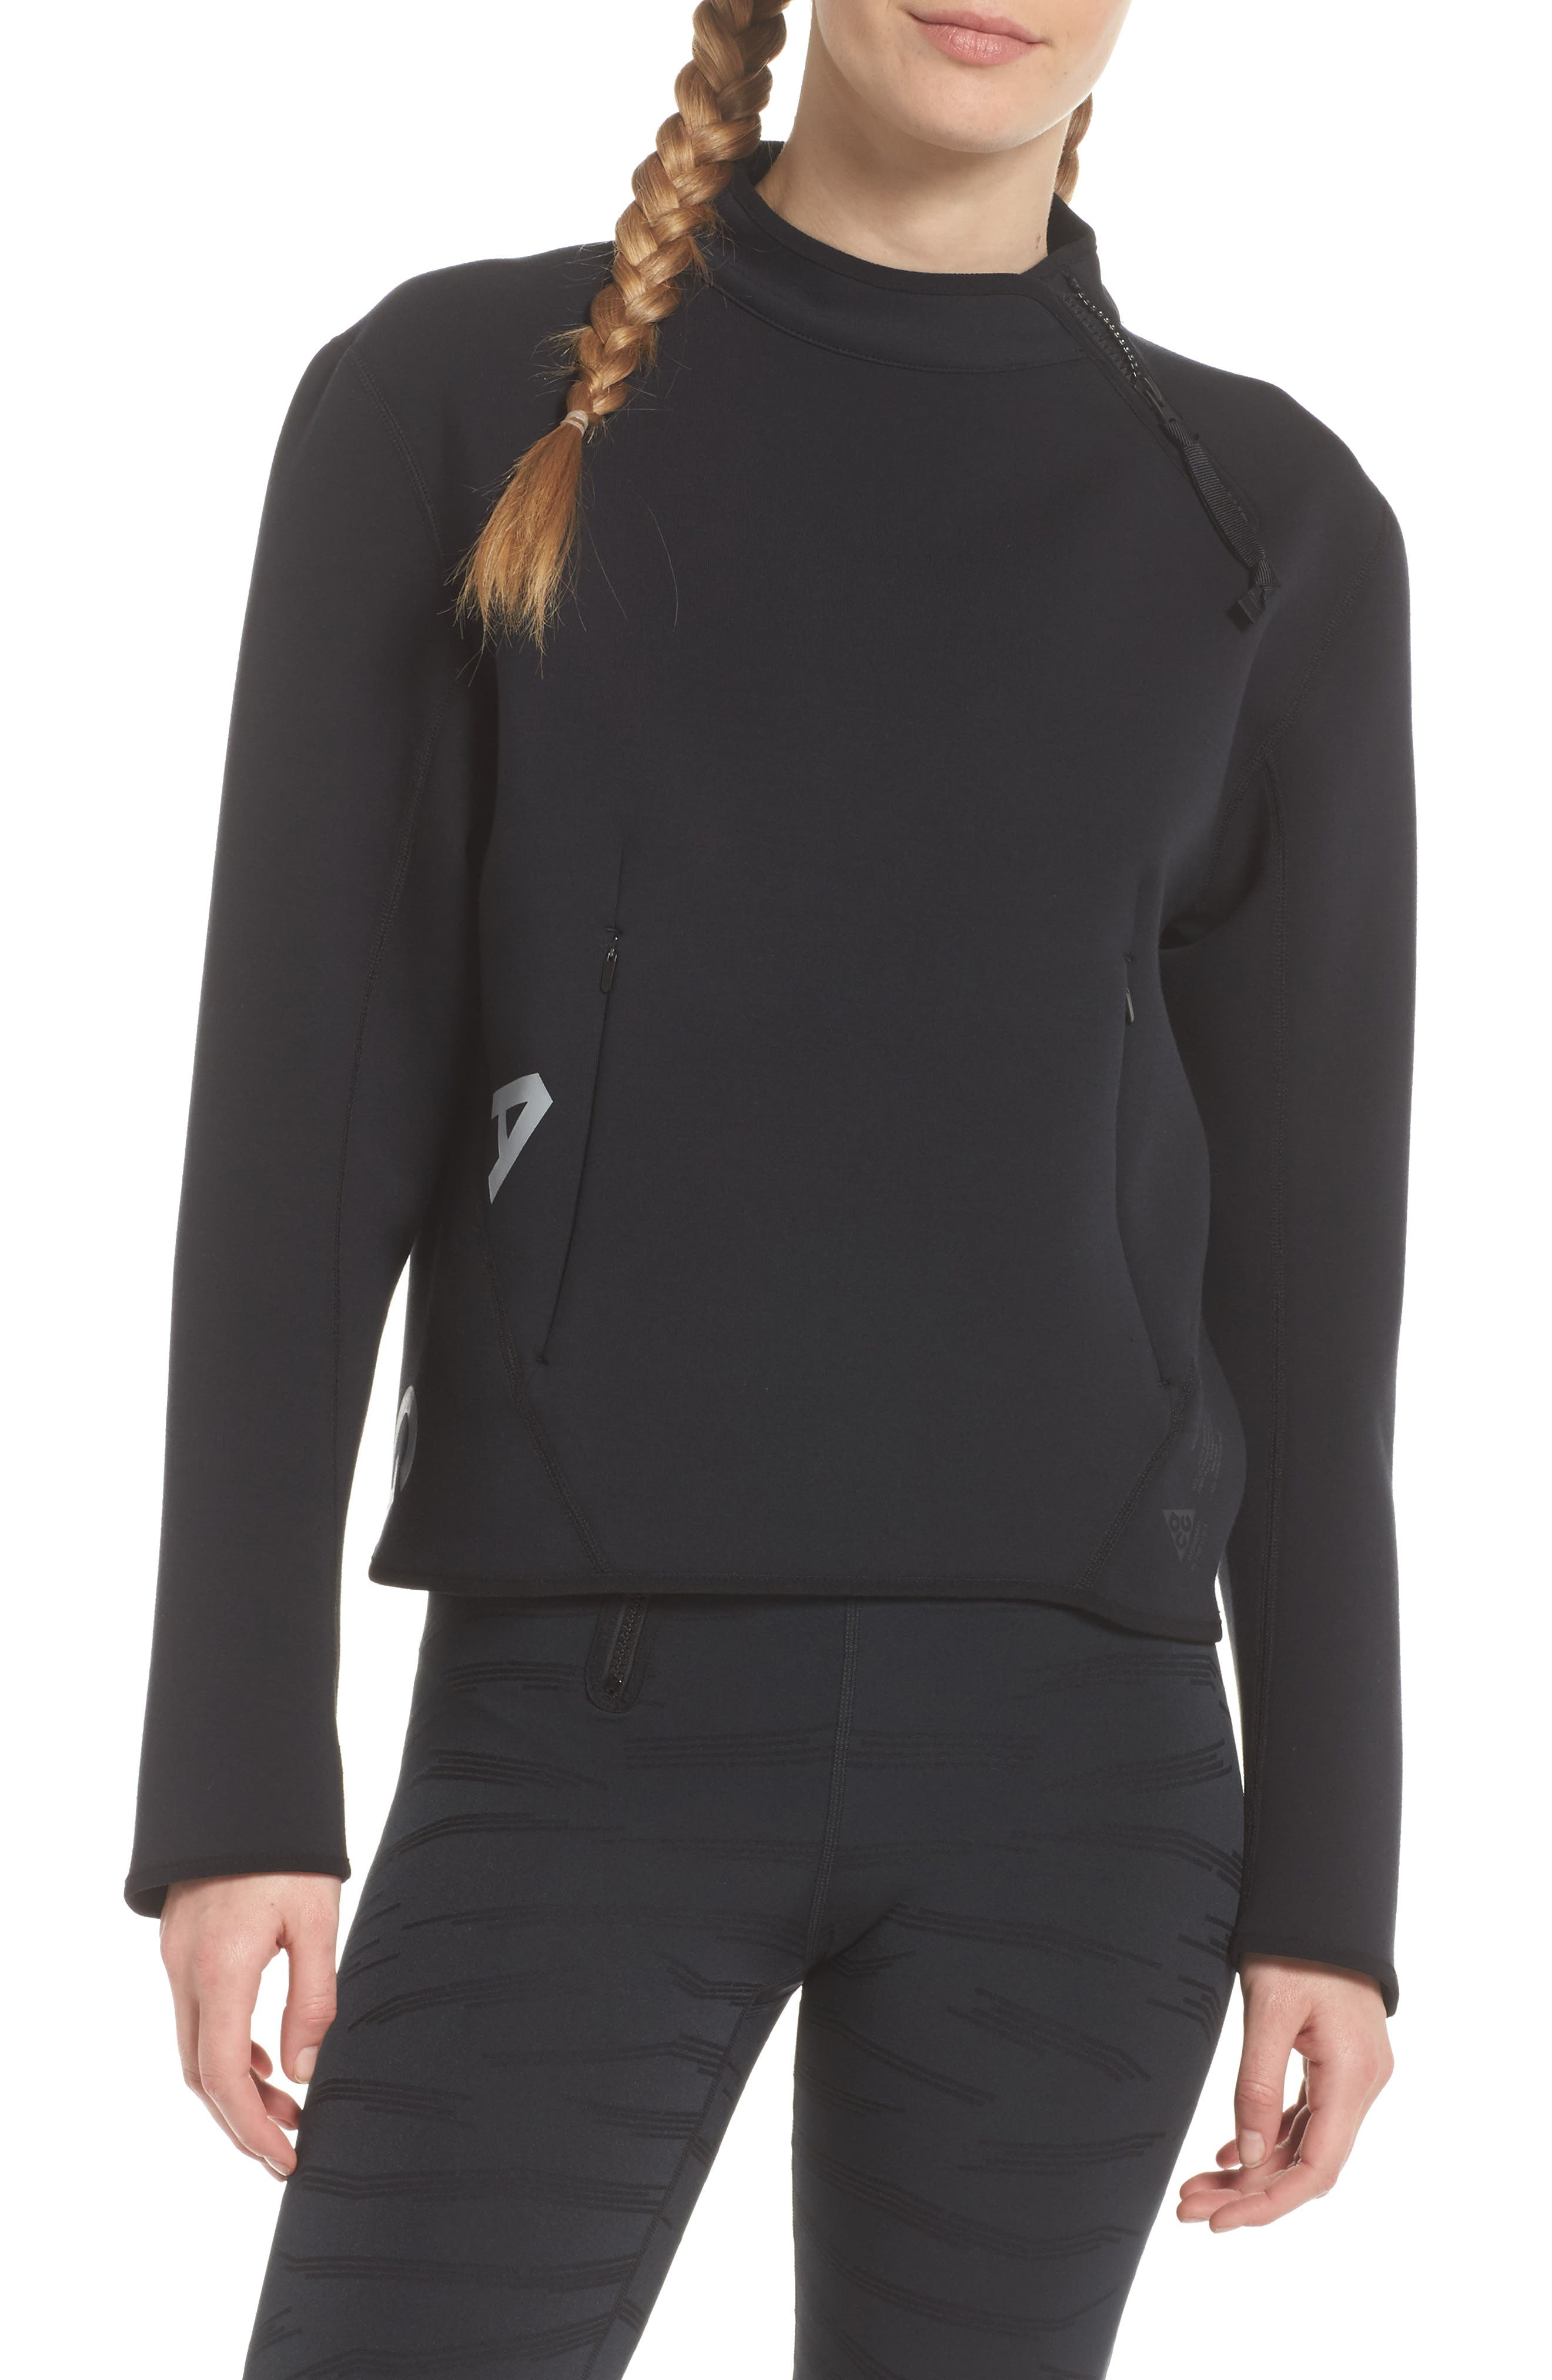 Alternate Image 1 Selected - Nike NikeLab ACG Fleece Women's Crewneck Top